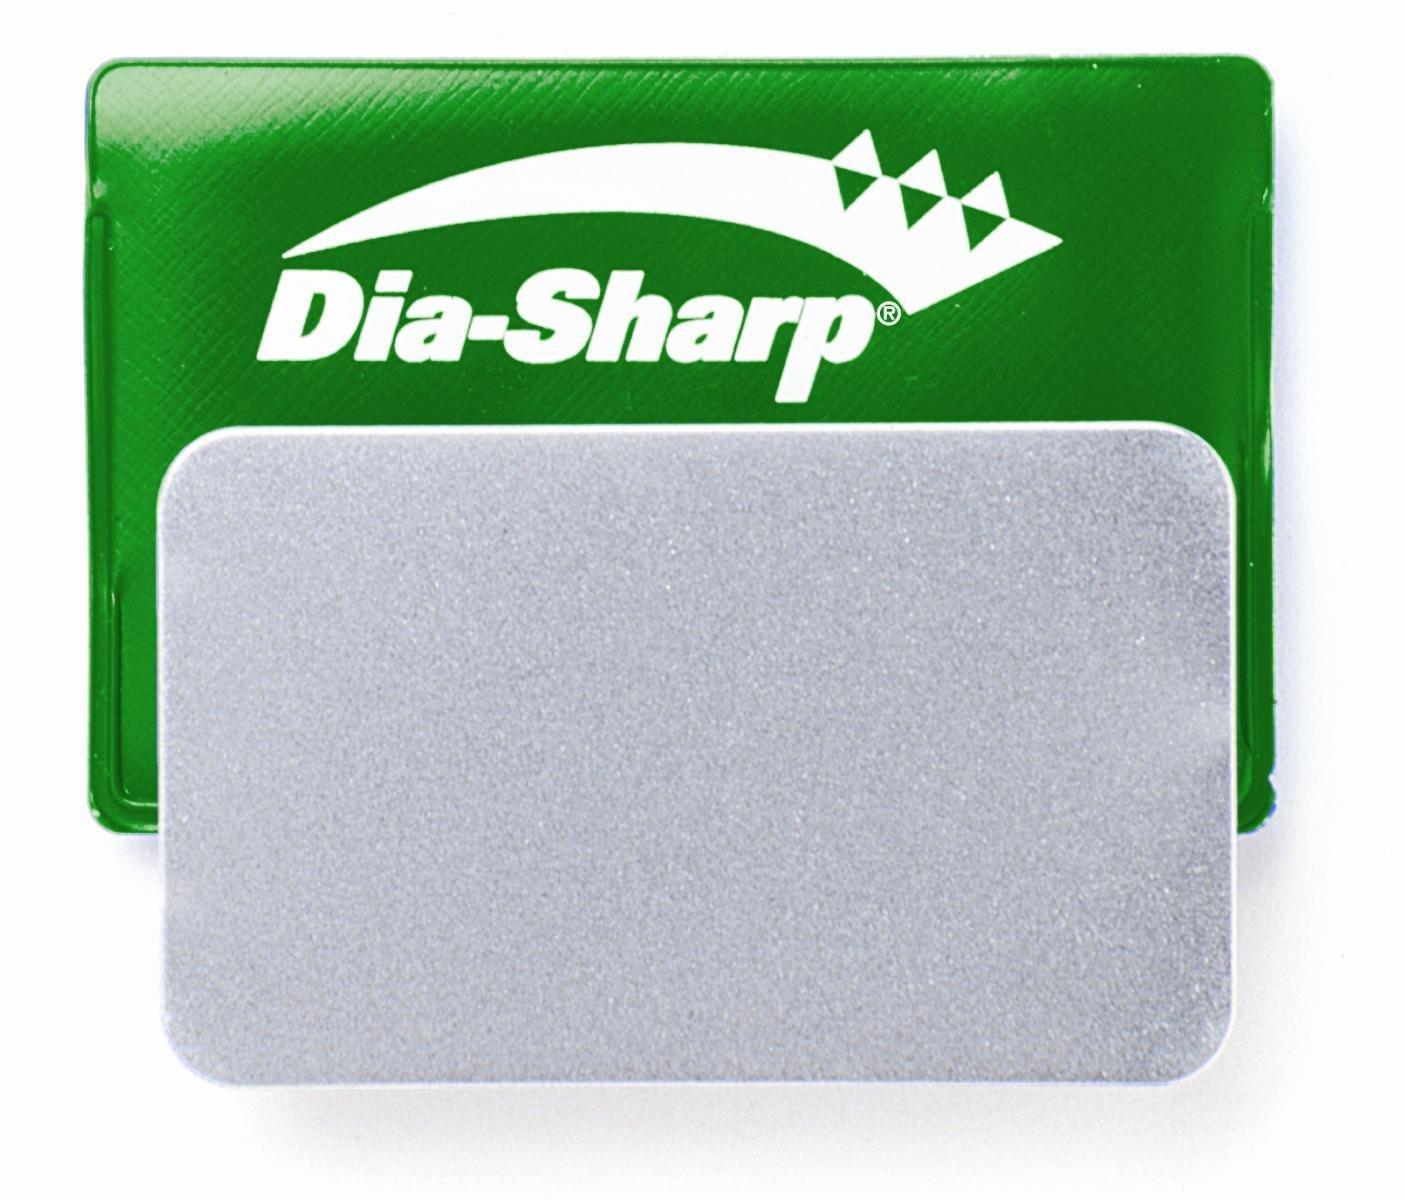 DMT D3E 3-Inch Dia-Sharp Sharpener Credit Card Sized Extra-Fine